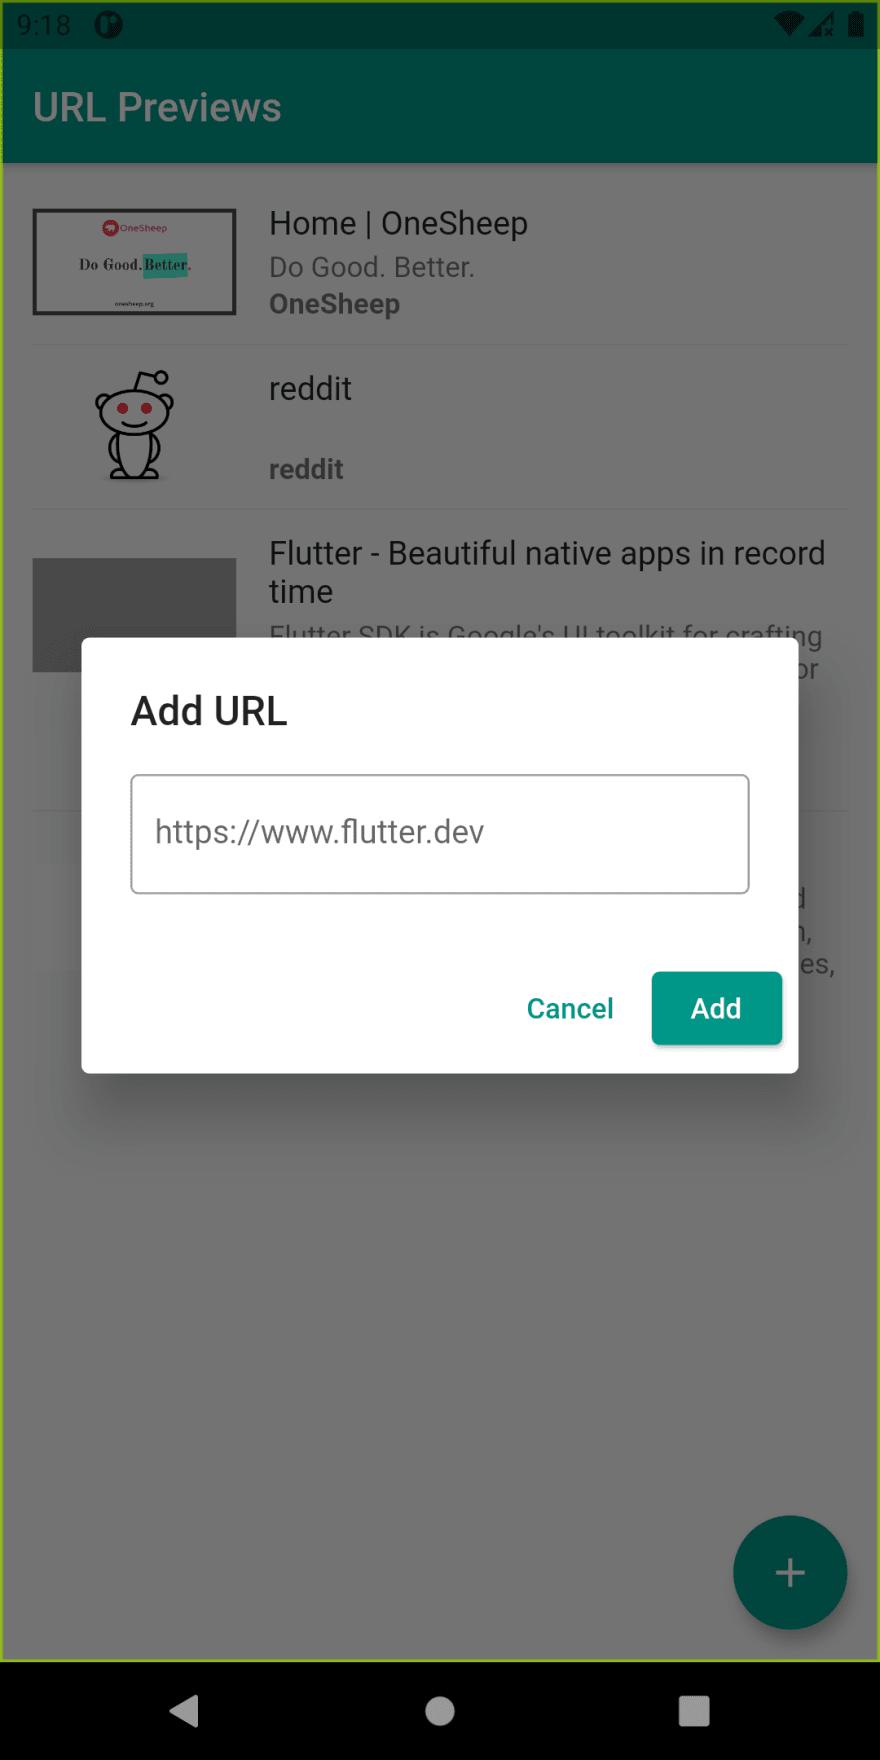 Adding new URL